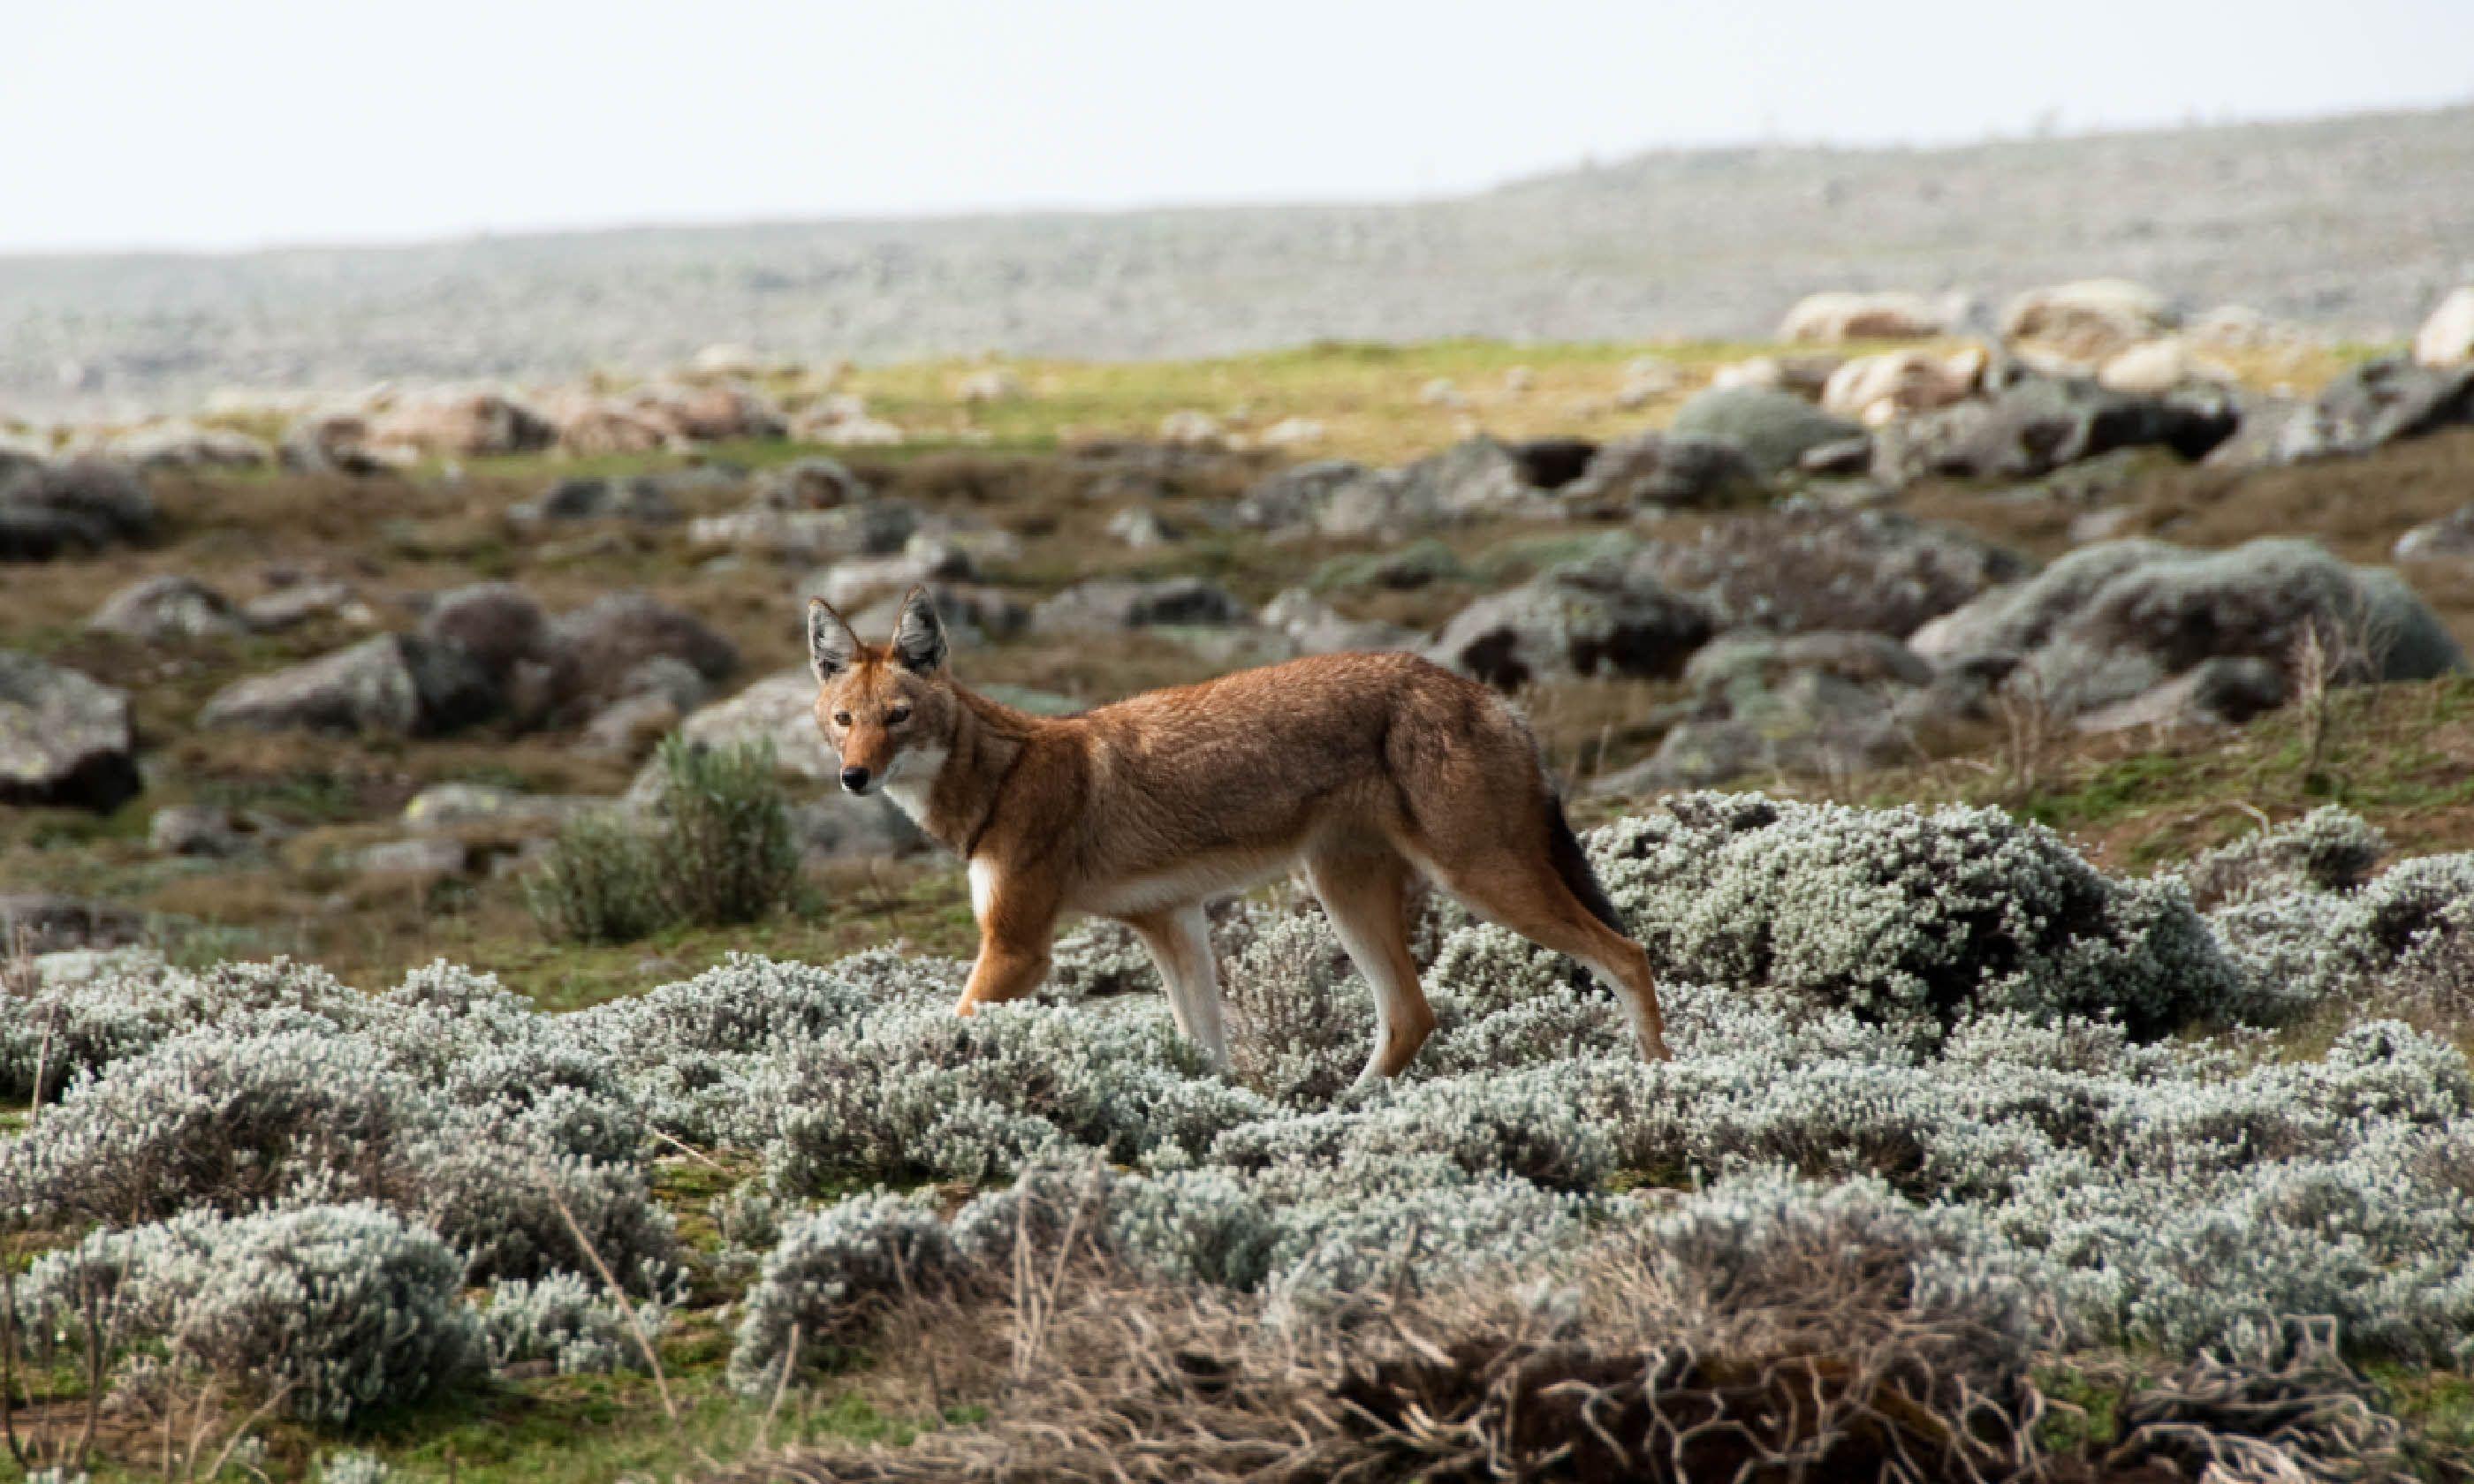 Simien wolf, Ethiopian Highlands (Shutterstock)